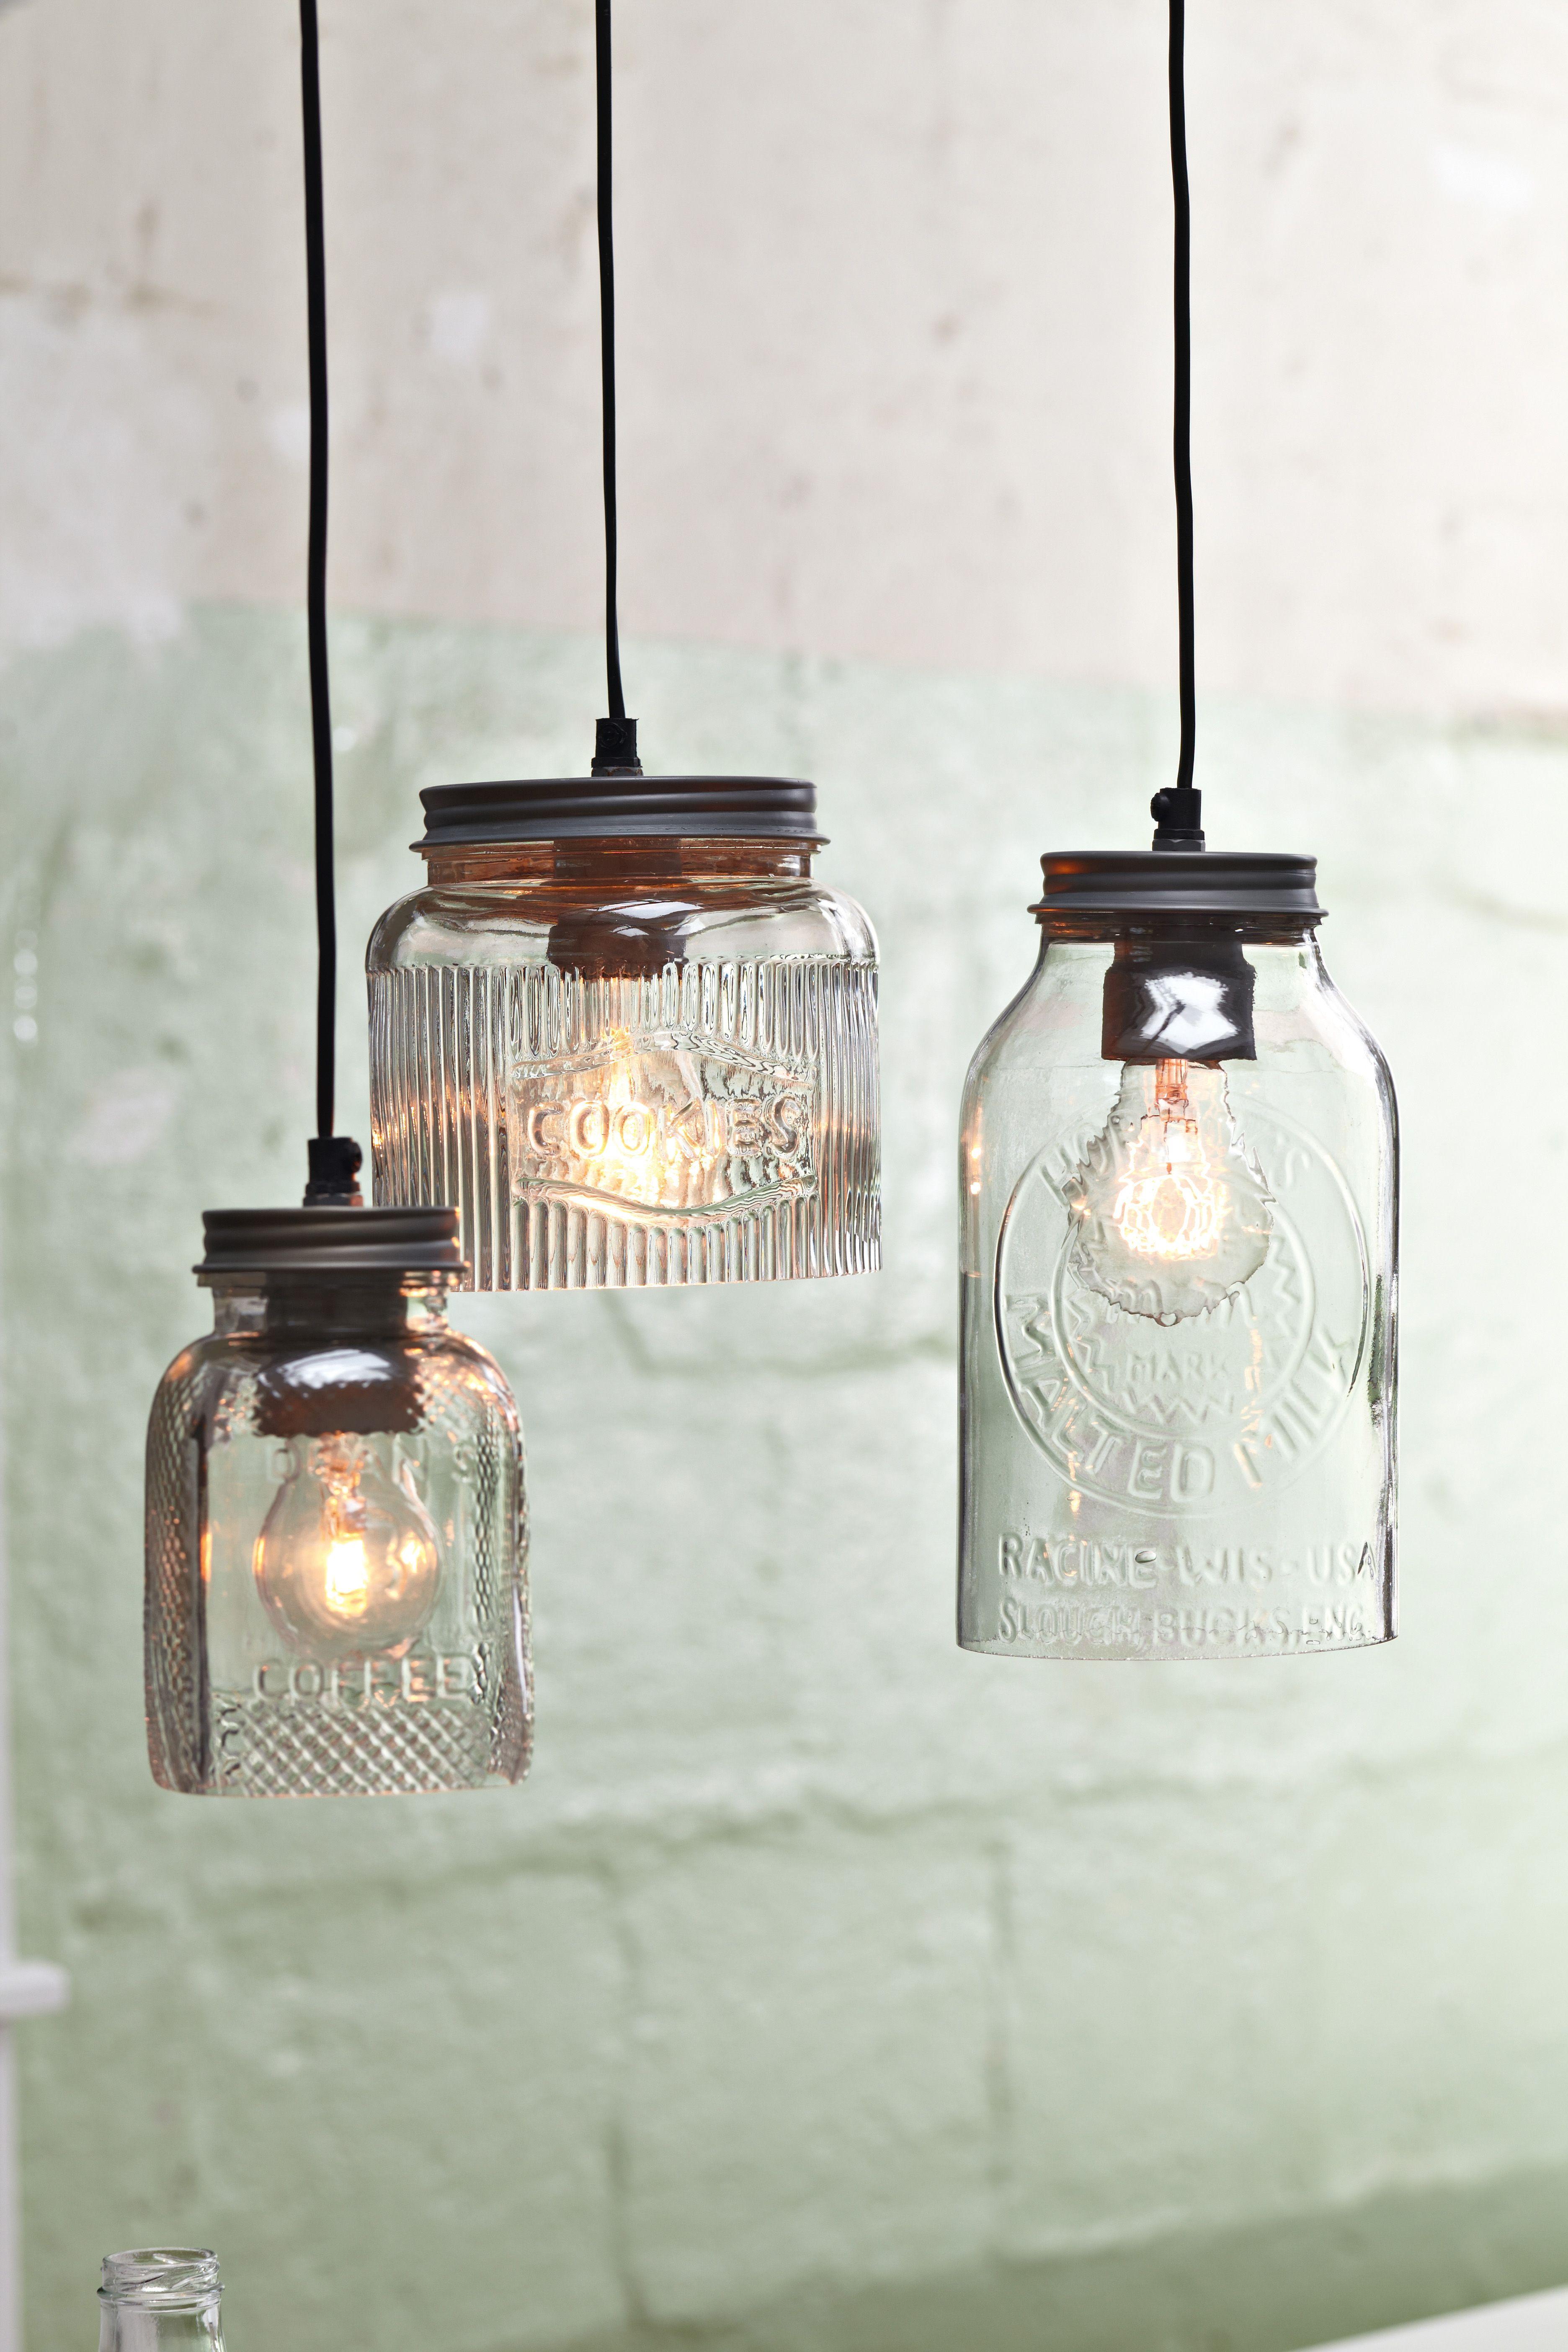 Good Marmeladengl ser als Lampe mason jar lamp impressionen moebel licht